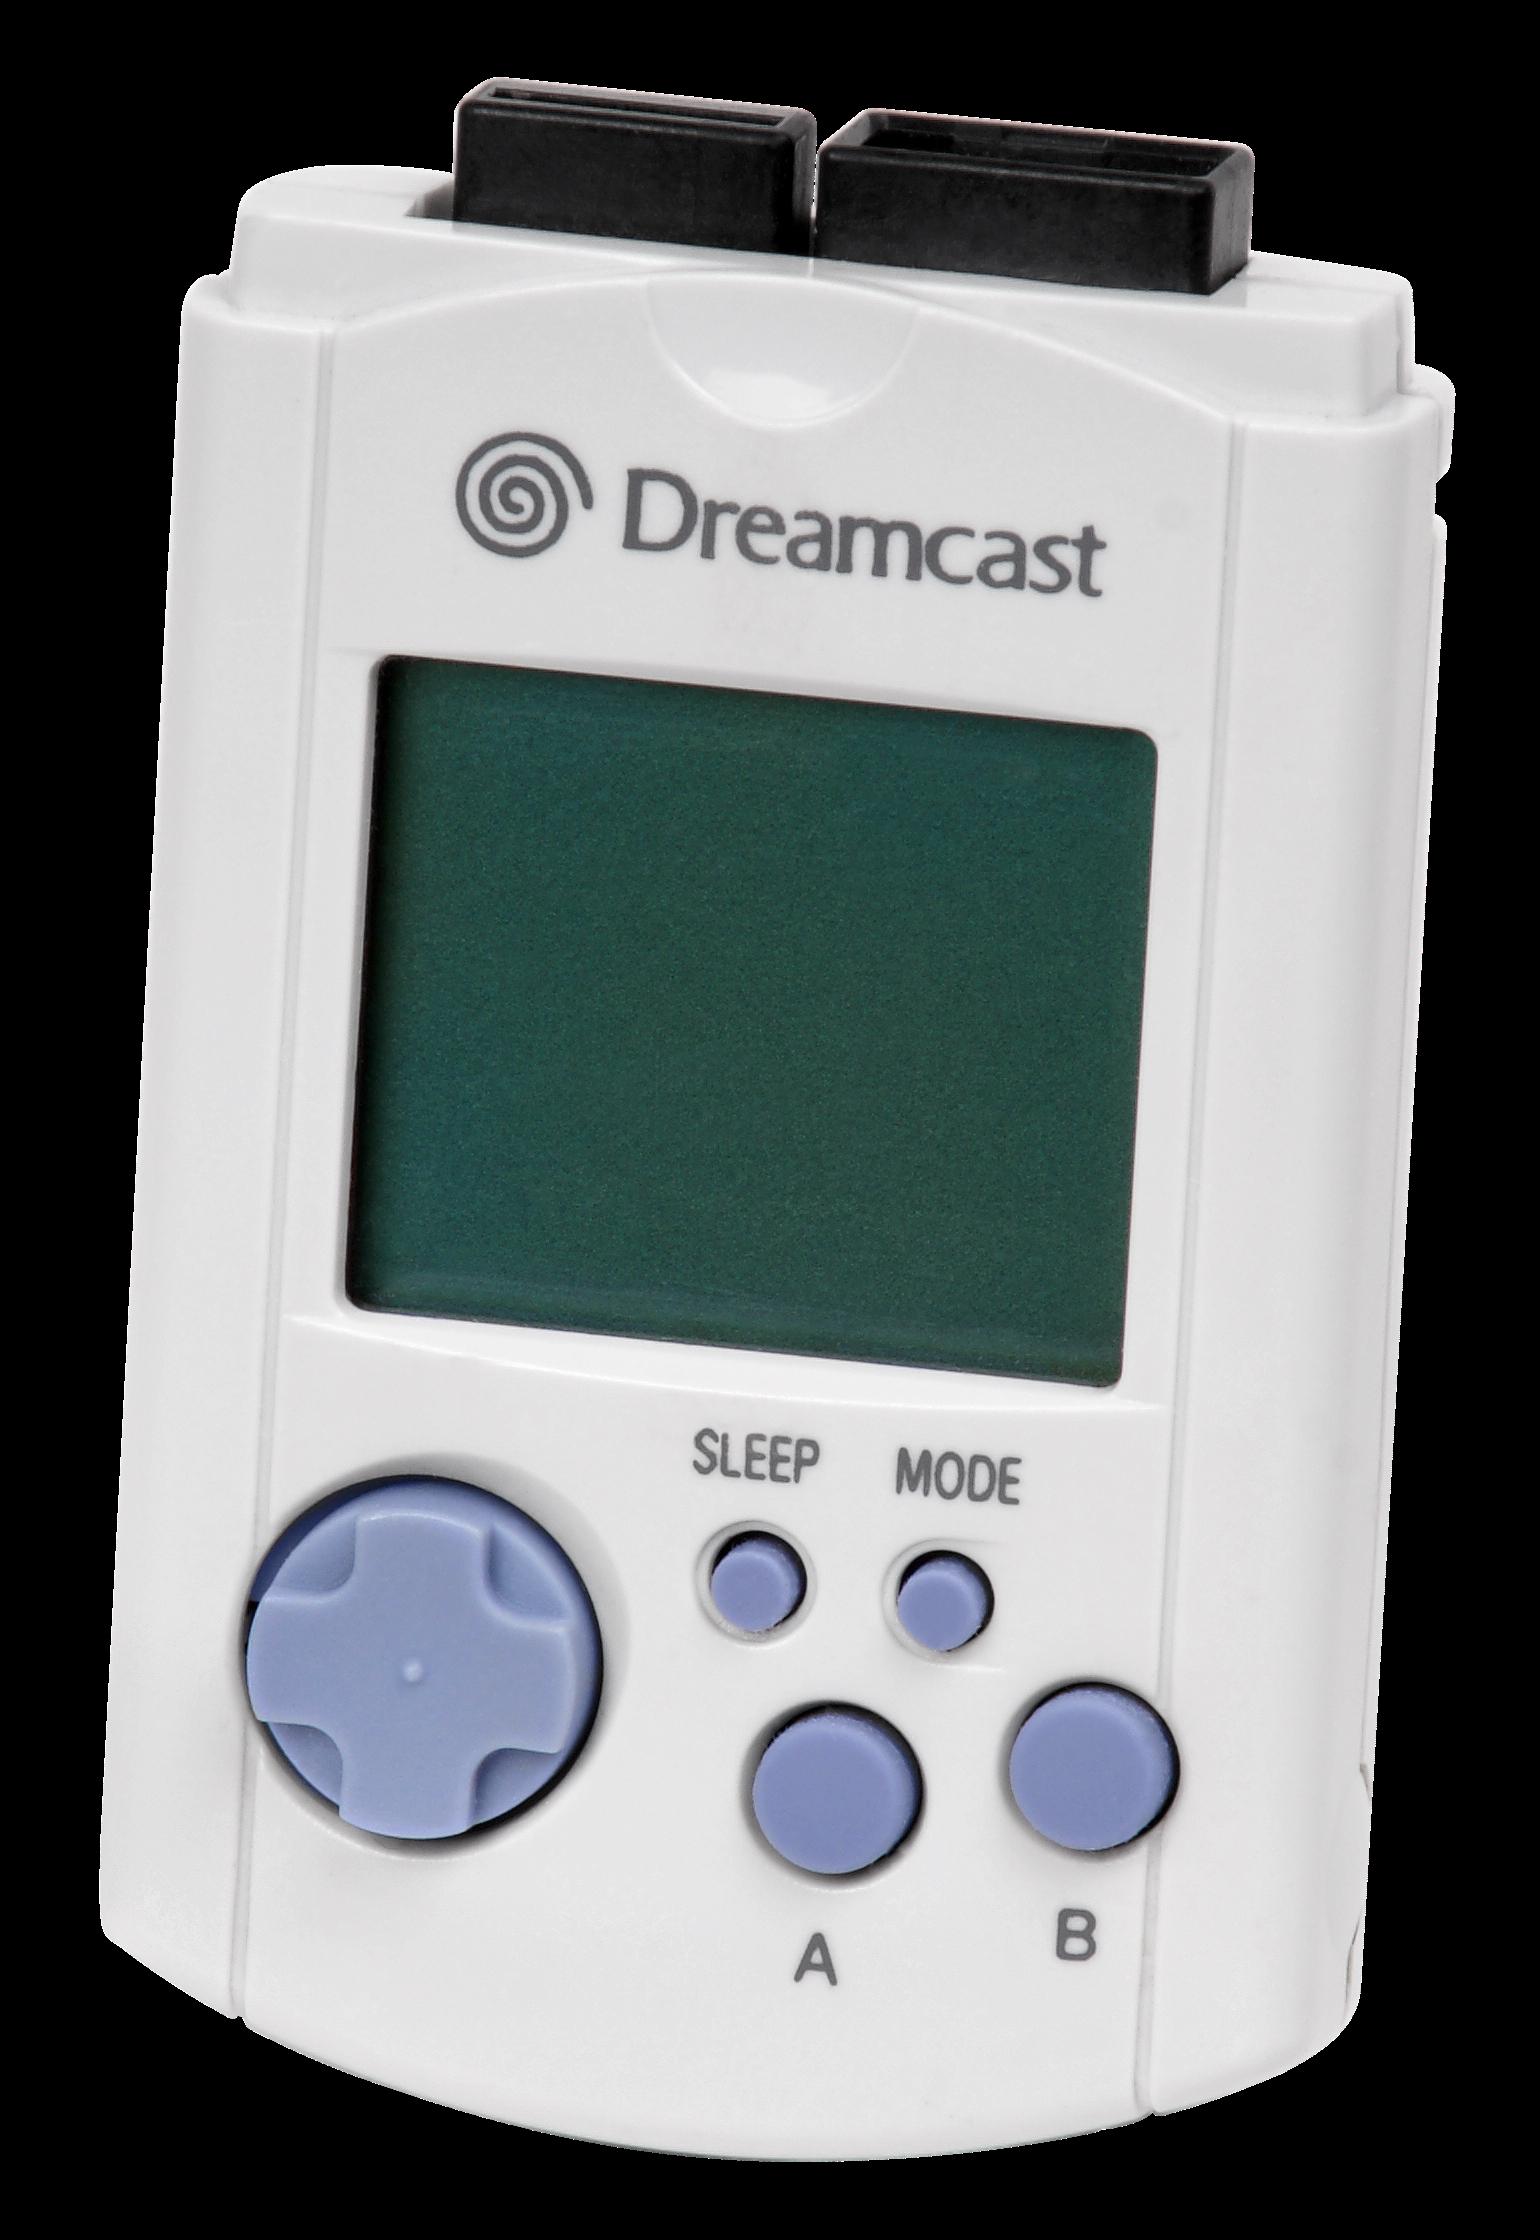 Dreamcast 2 release date in Perth